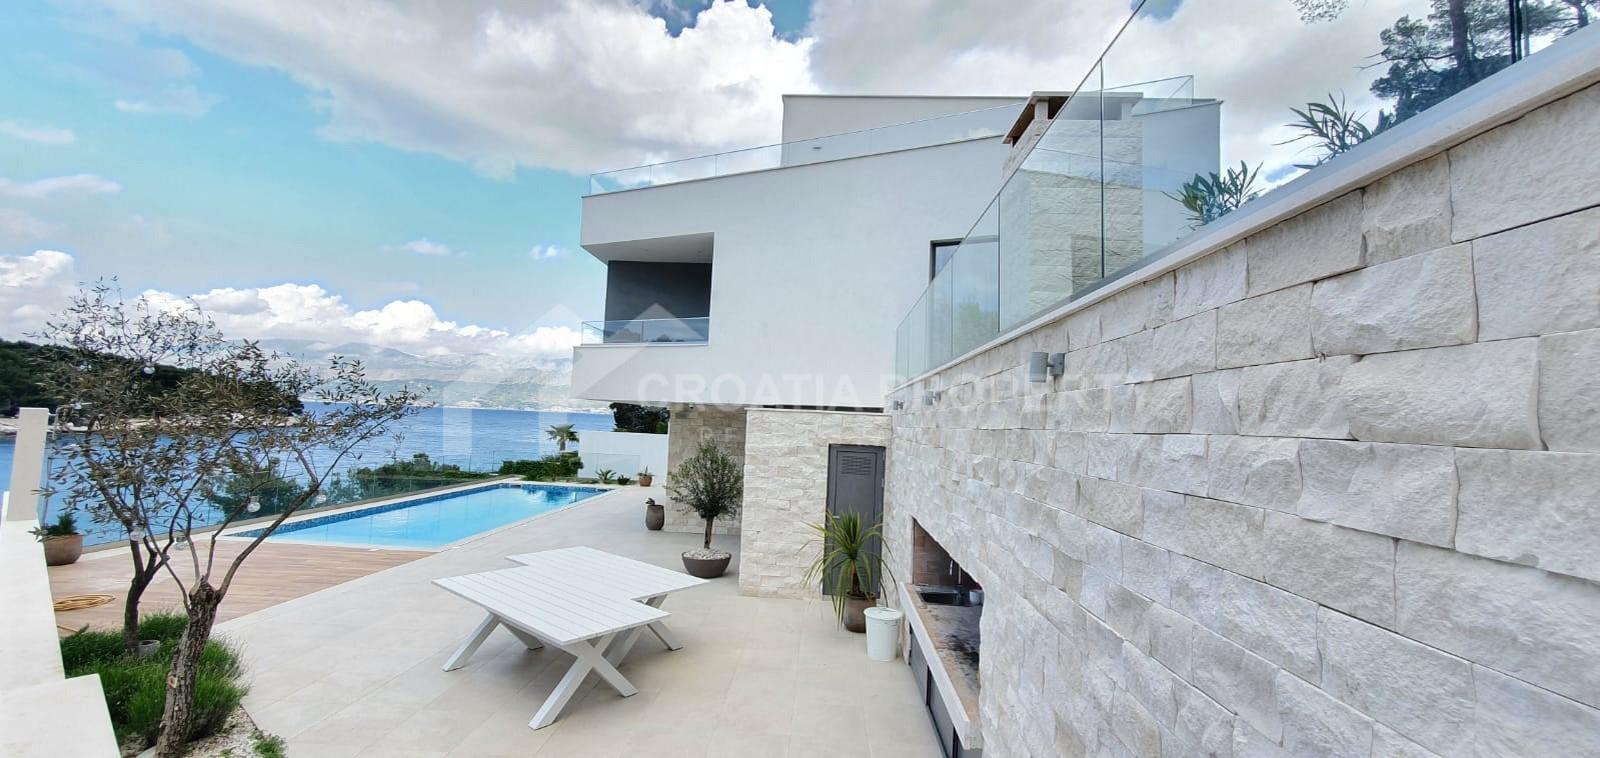 Waterfront villa for sale Brac